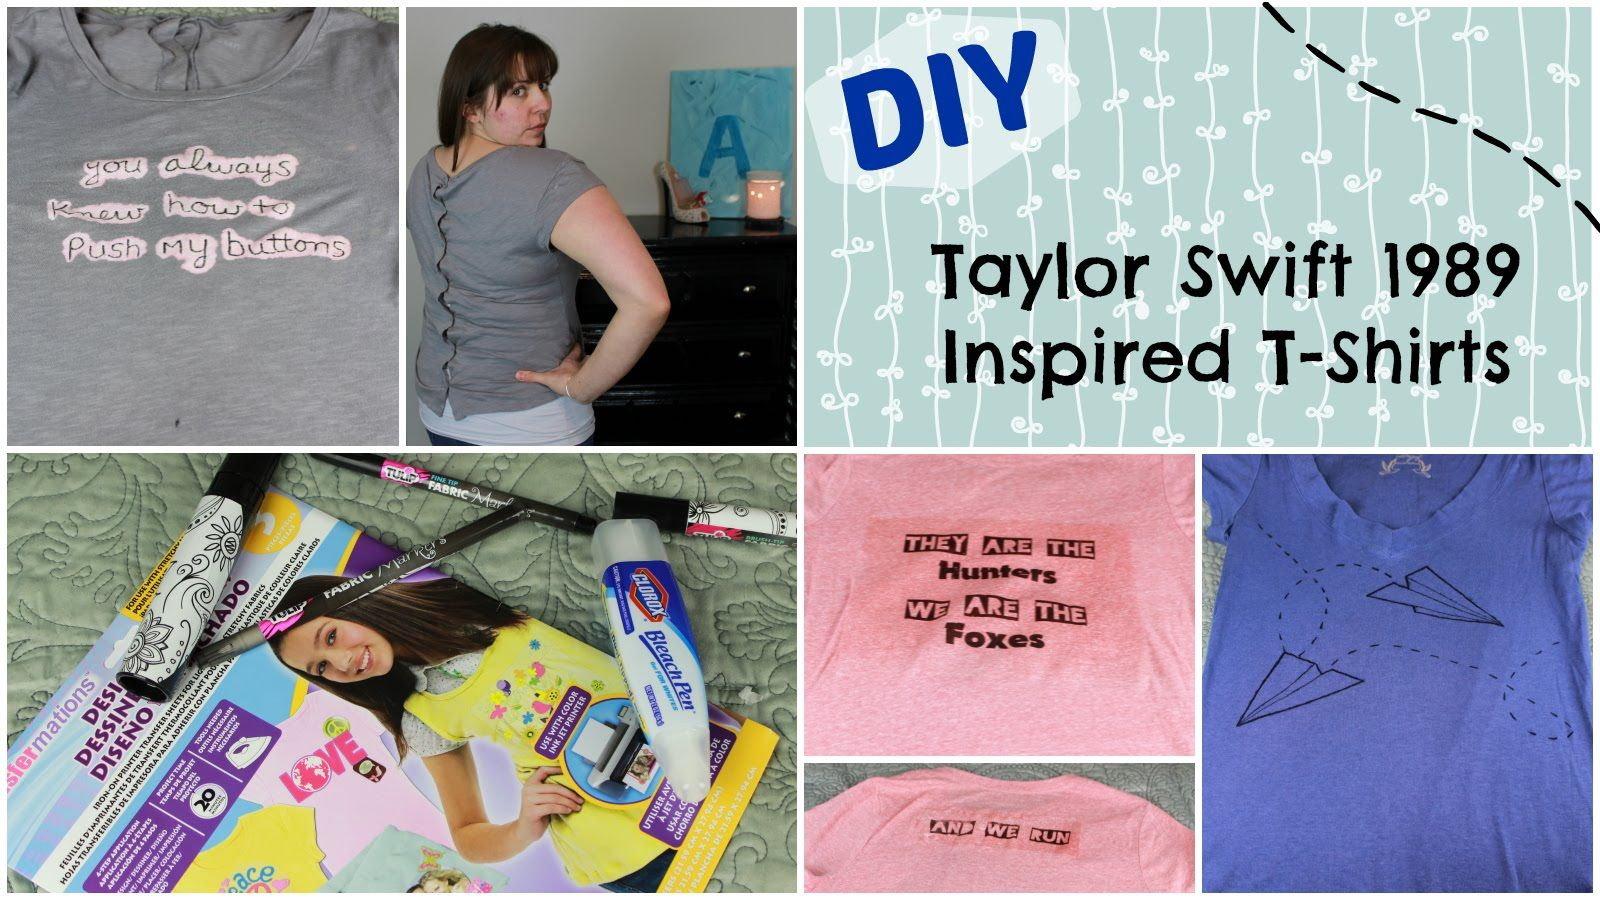 DIY Taylor Swift Inspired Shirts | 1989 Swifty